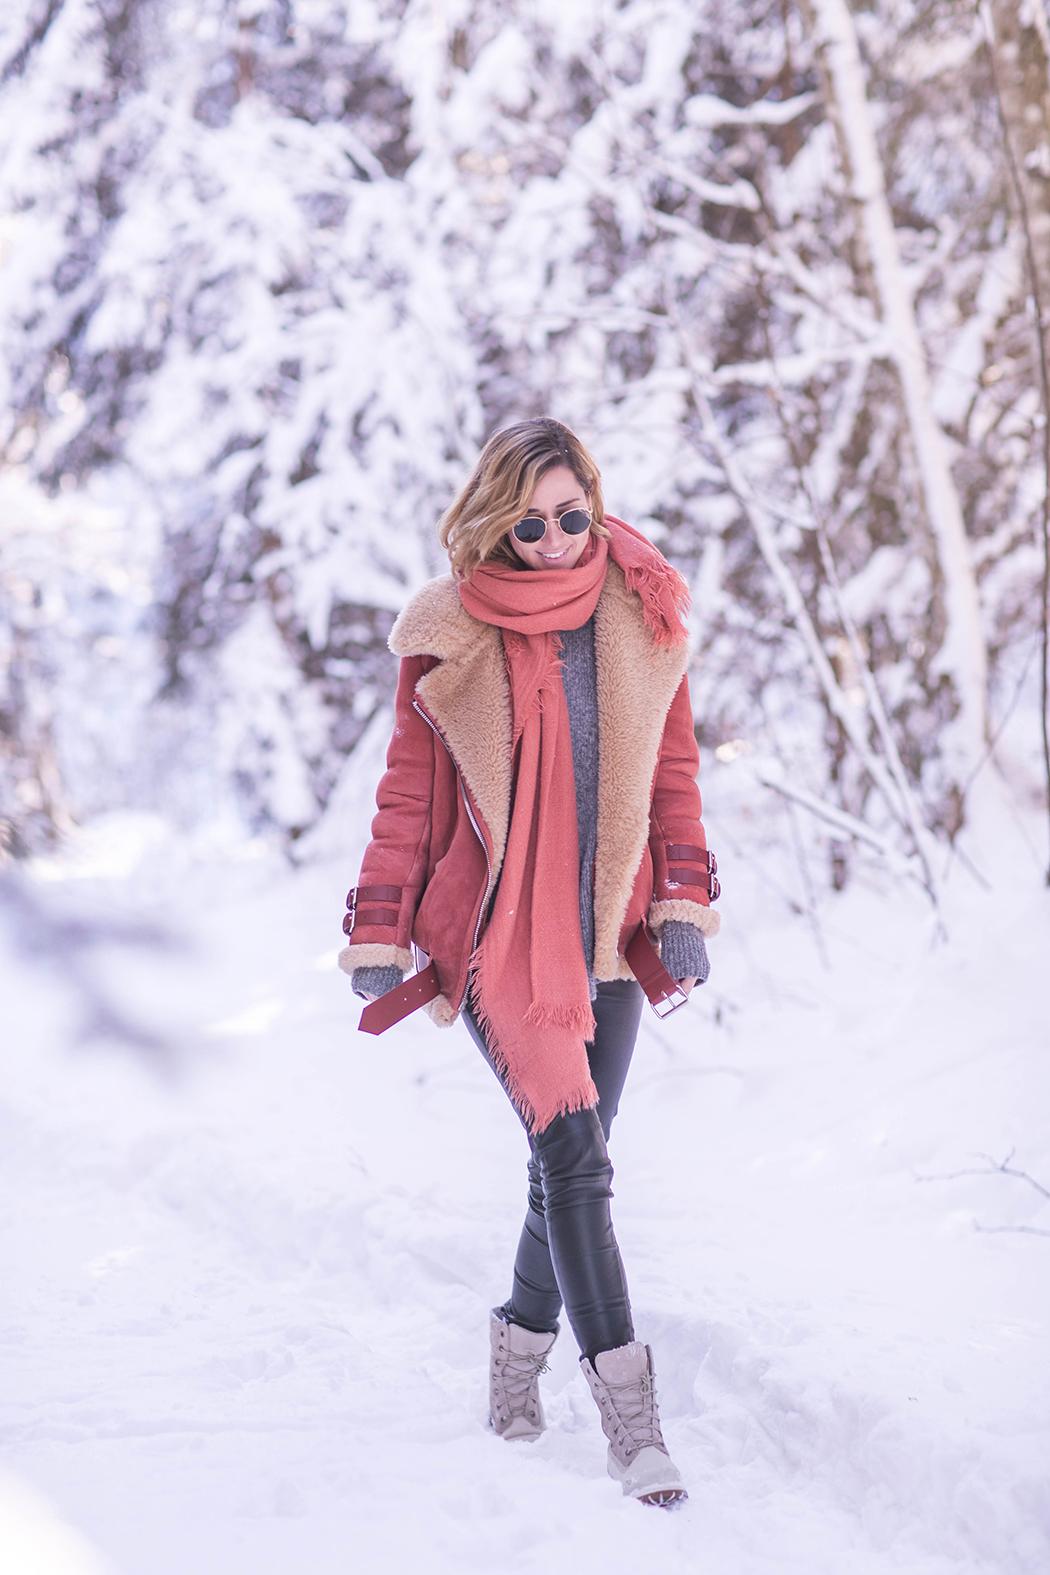 Lifestyleblog-Lifestyleblogger-Lifestyle-Blog-Blogger-Hahnenkammrennen-Mastercard-Lindarella-15-web